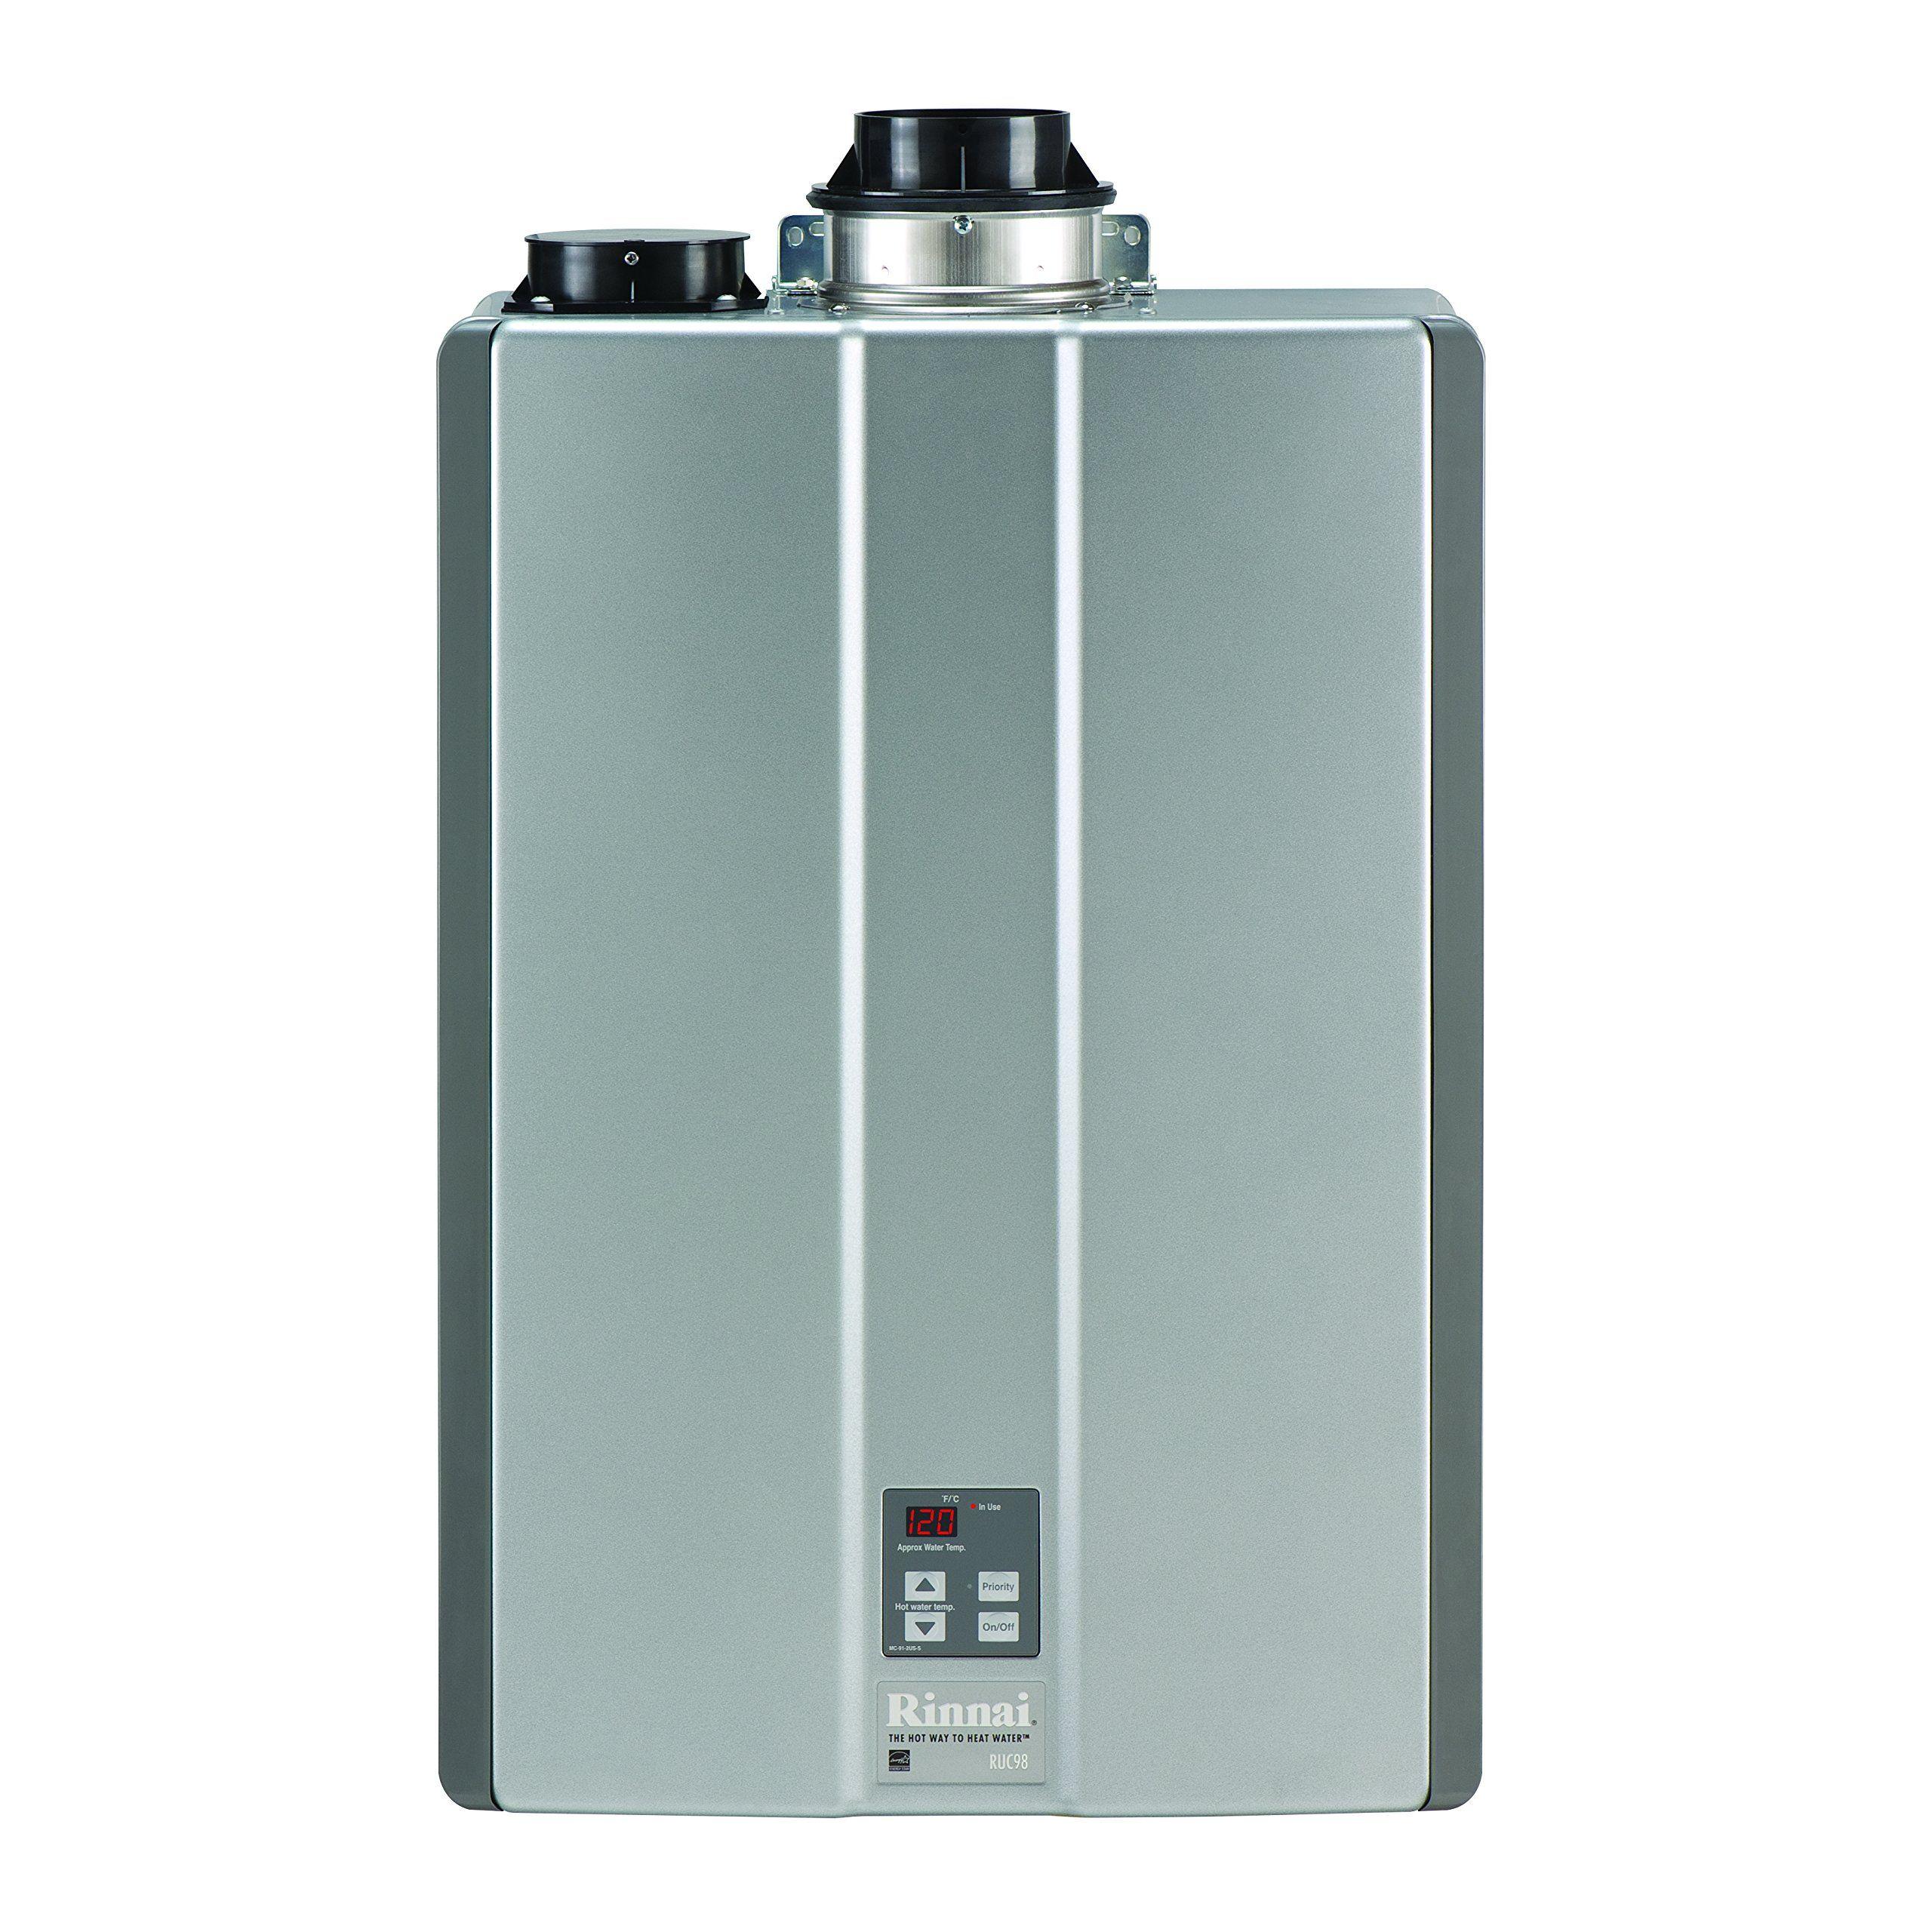 Pin On Tankless Water Heater Ideas